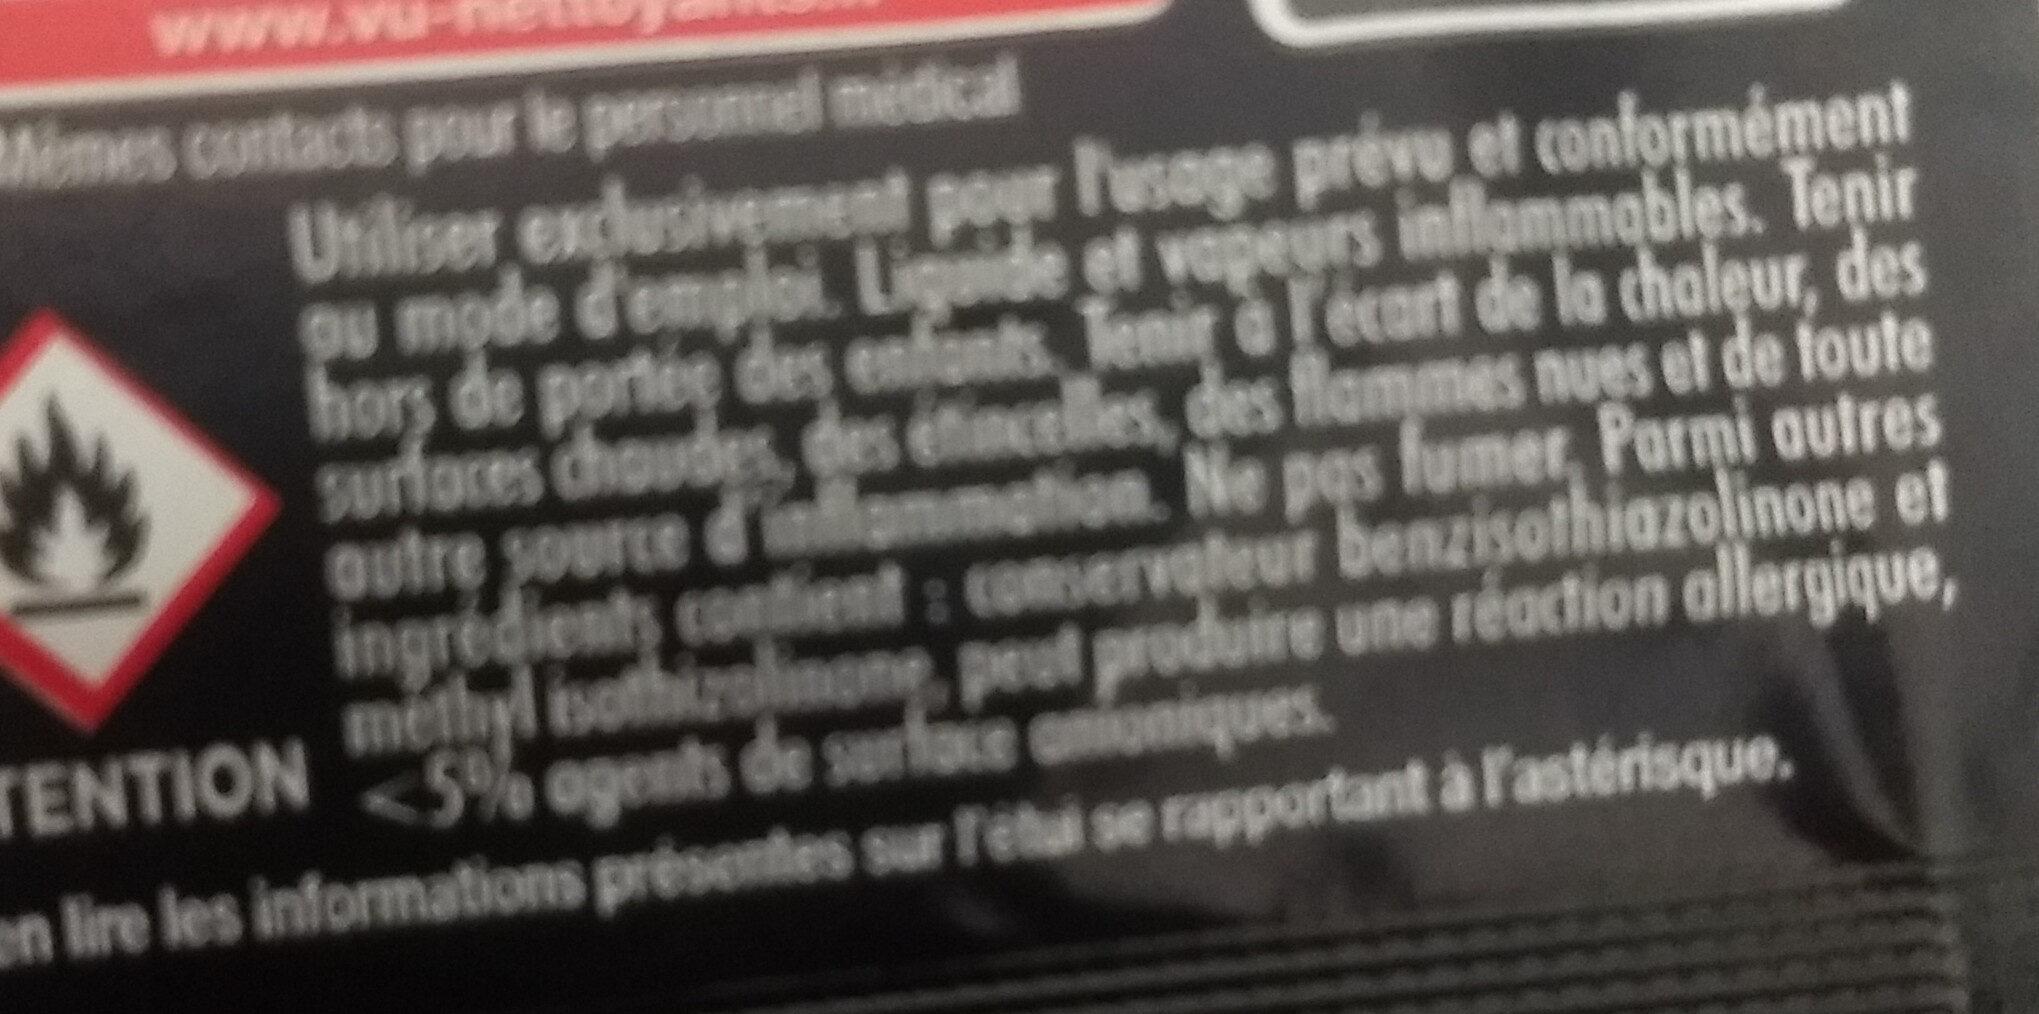 Lingette nettoyant optique - Ingredients - fr